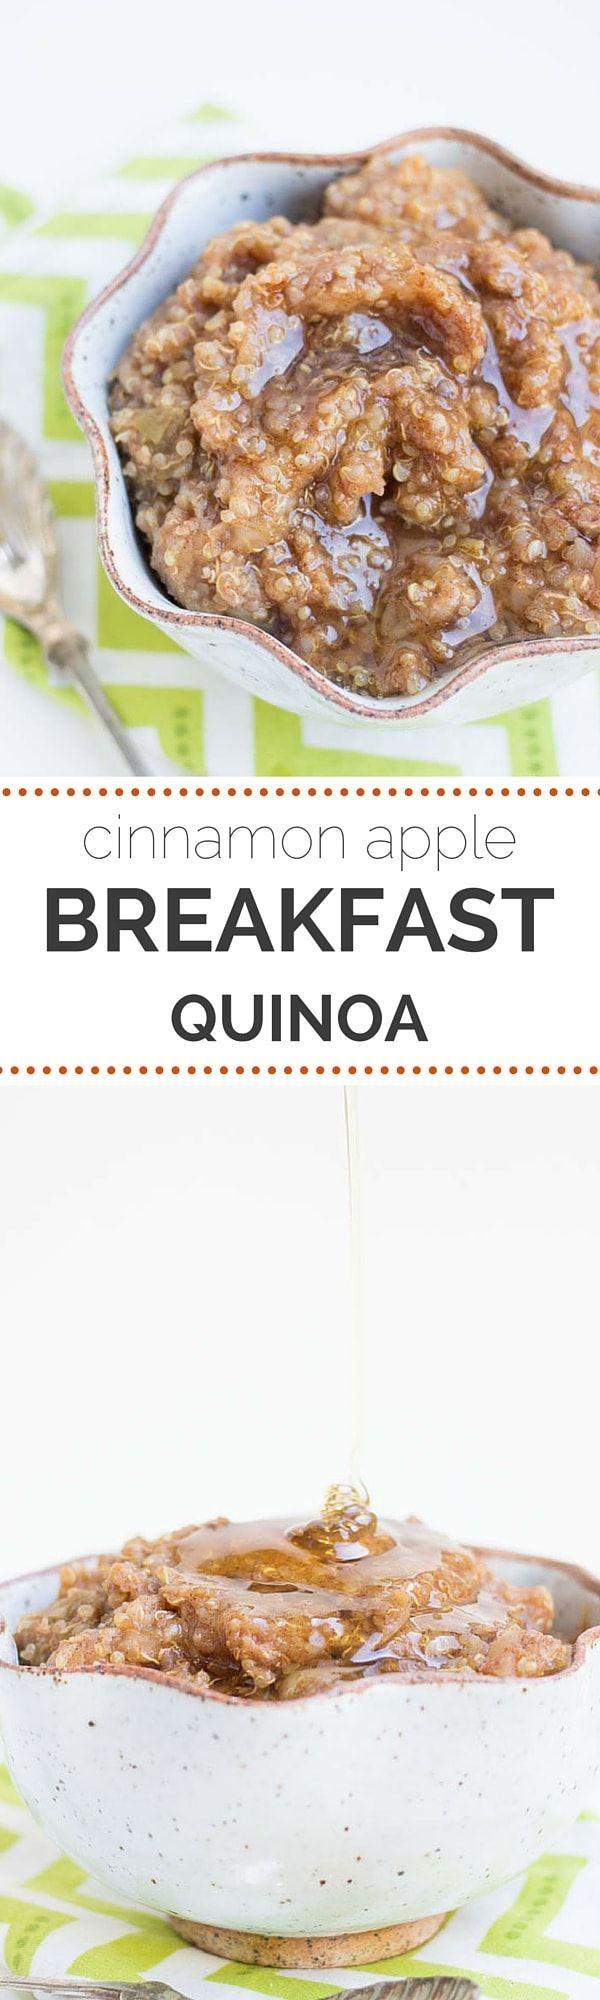 Recipe // Apples + Honey + Quinoa + Cinnamon + Water